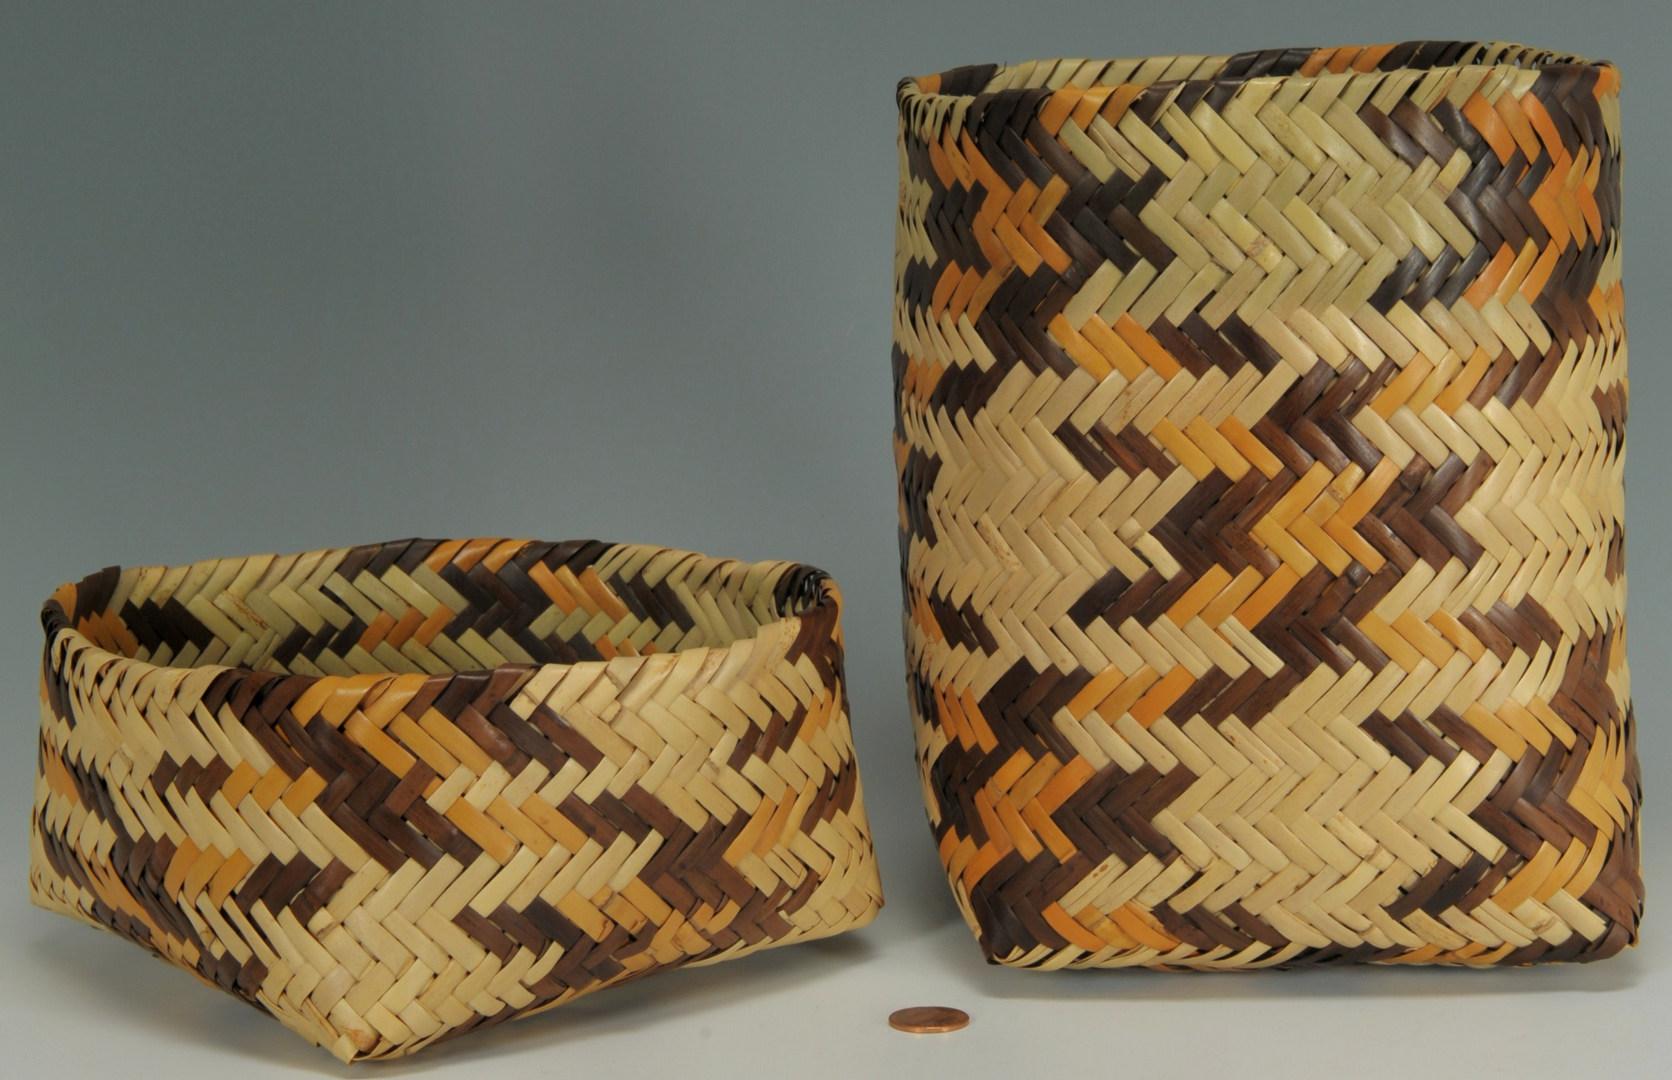 Lot 376: Cherokee rivercane basket, attr. R. Bradley